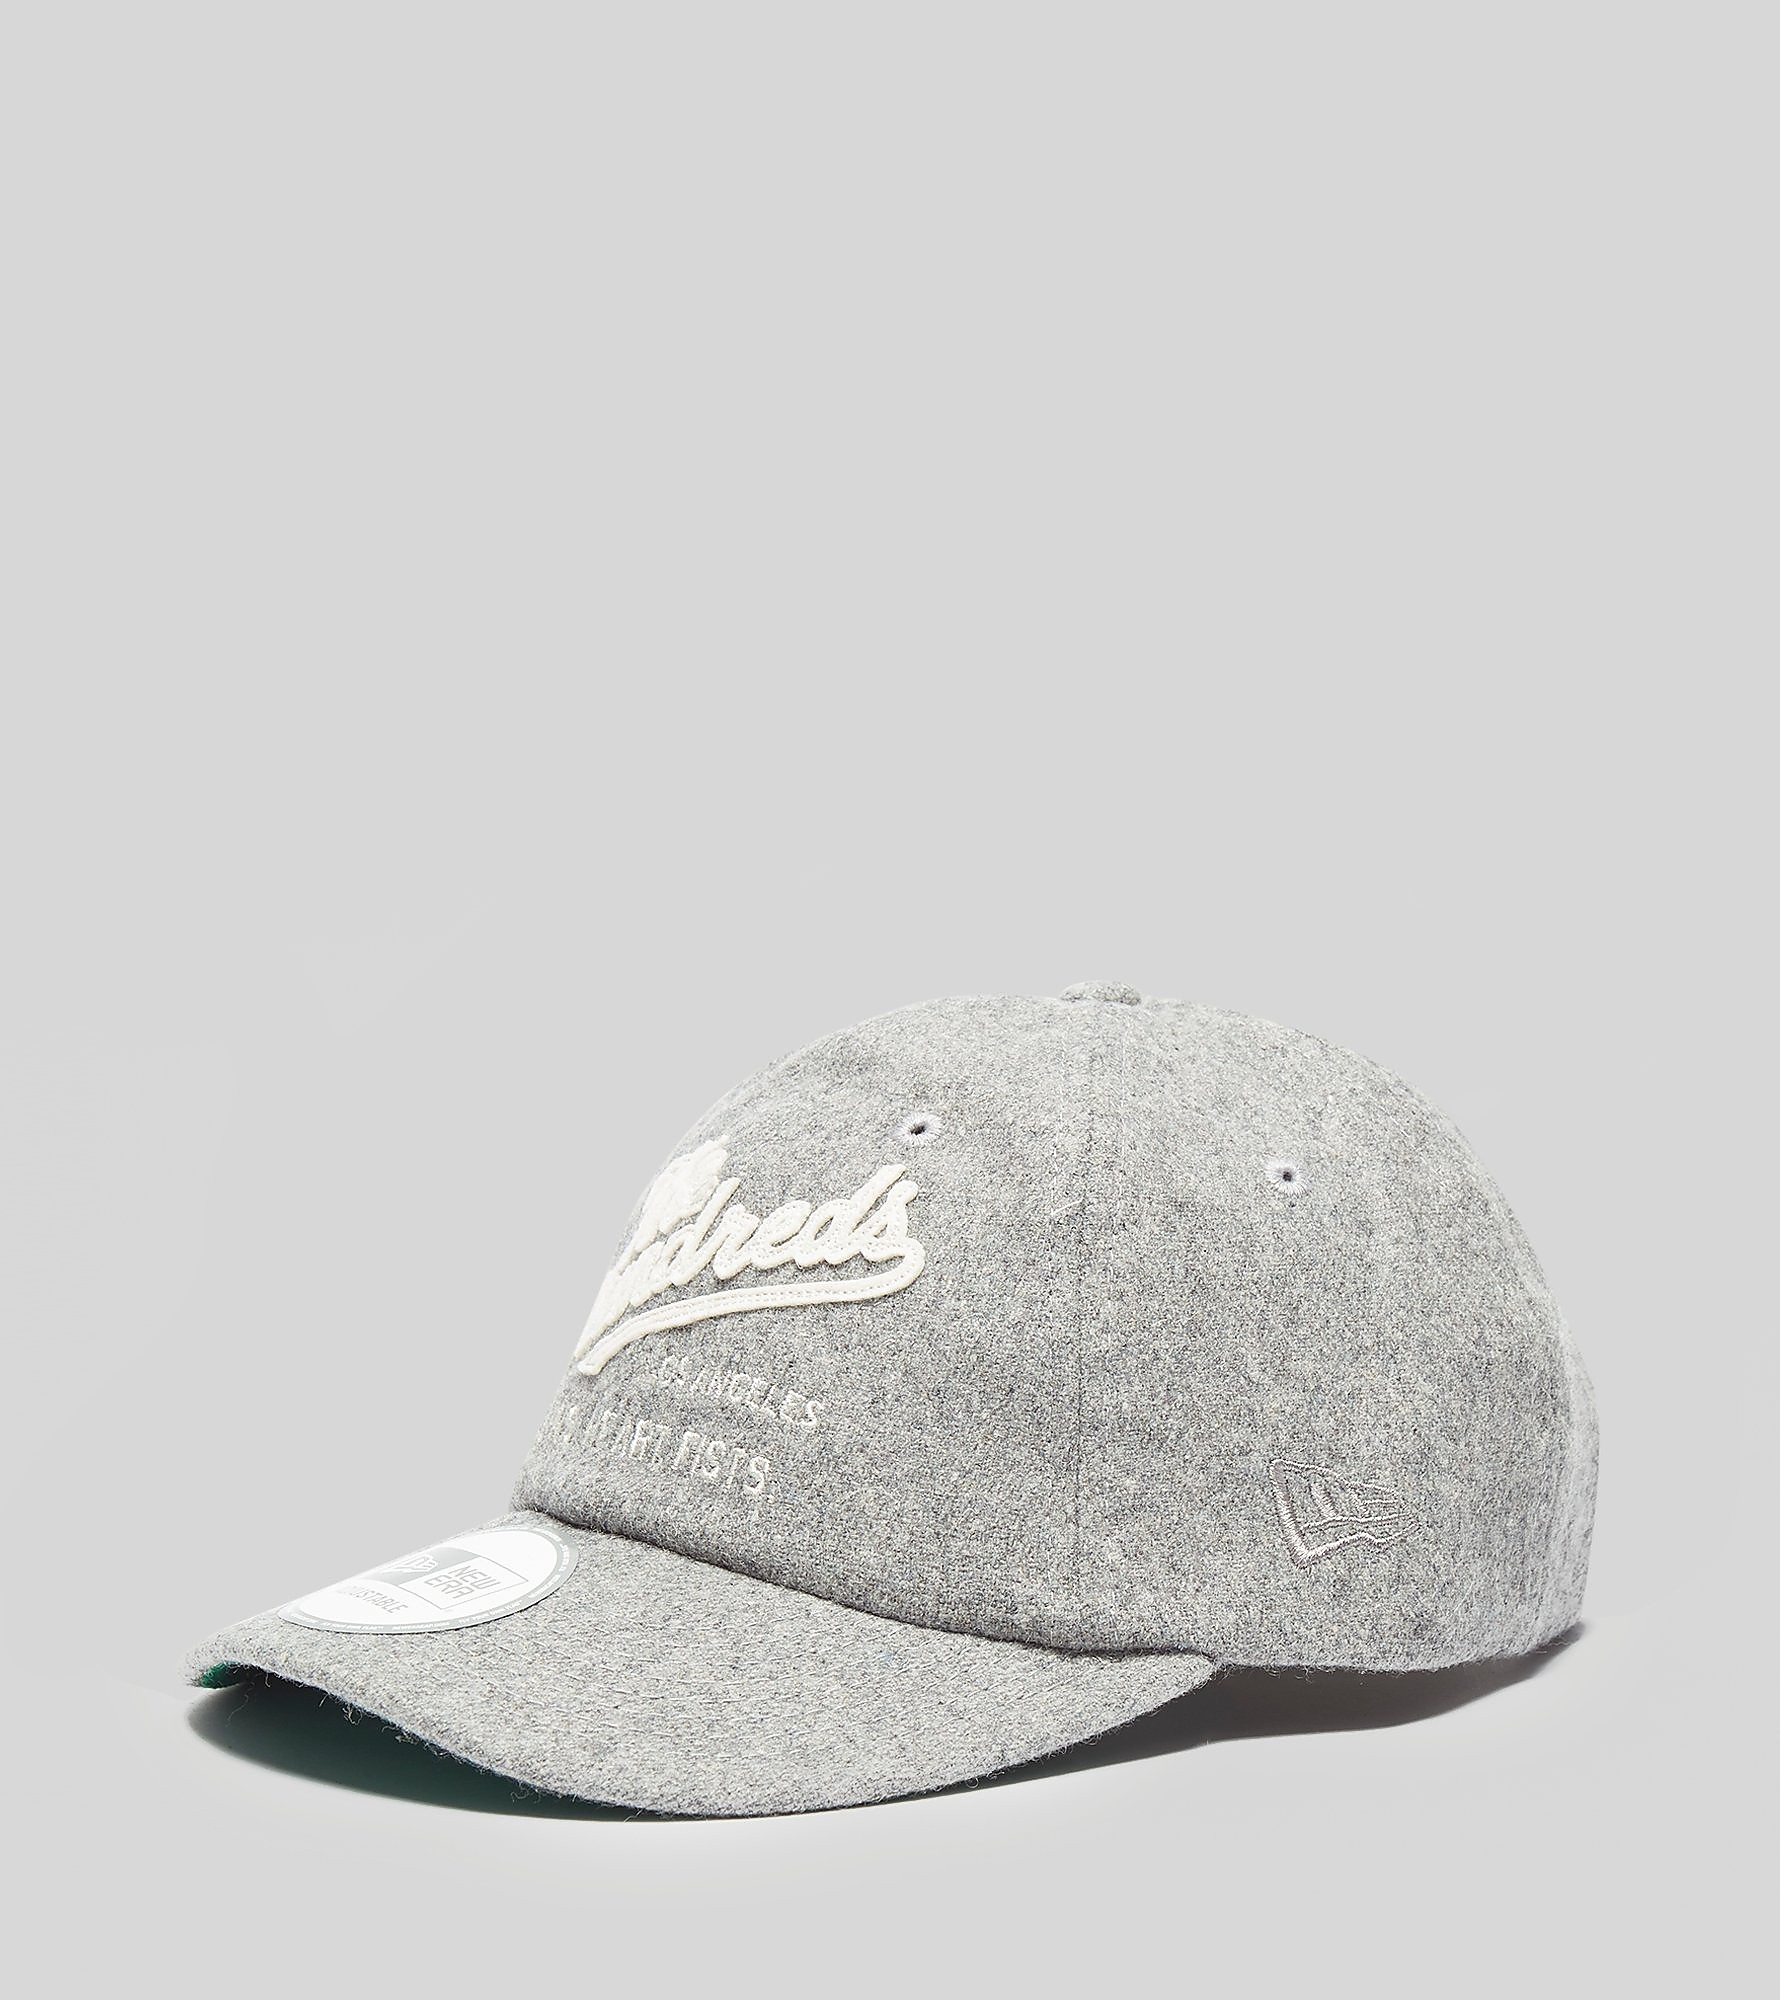 The Hundreds Sane Leather Strapback Cap